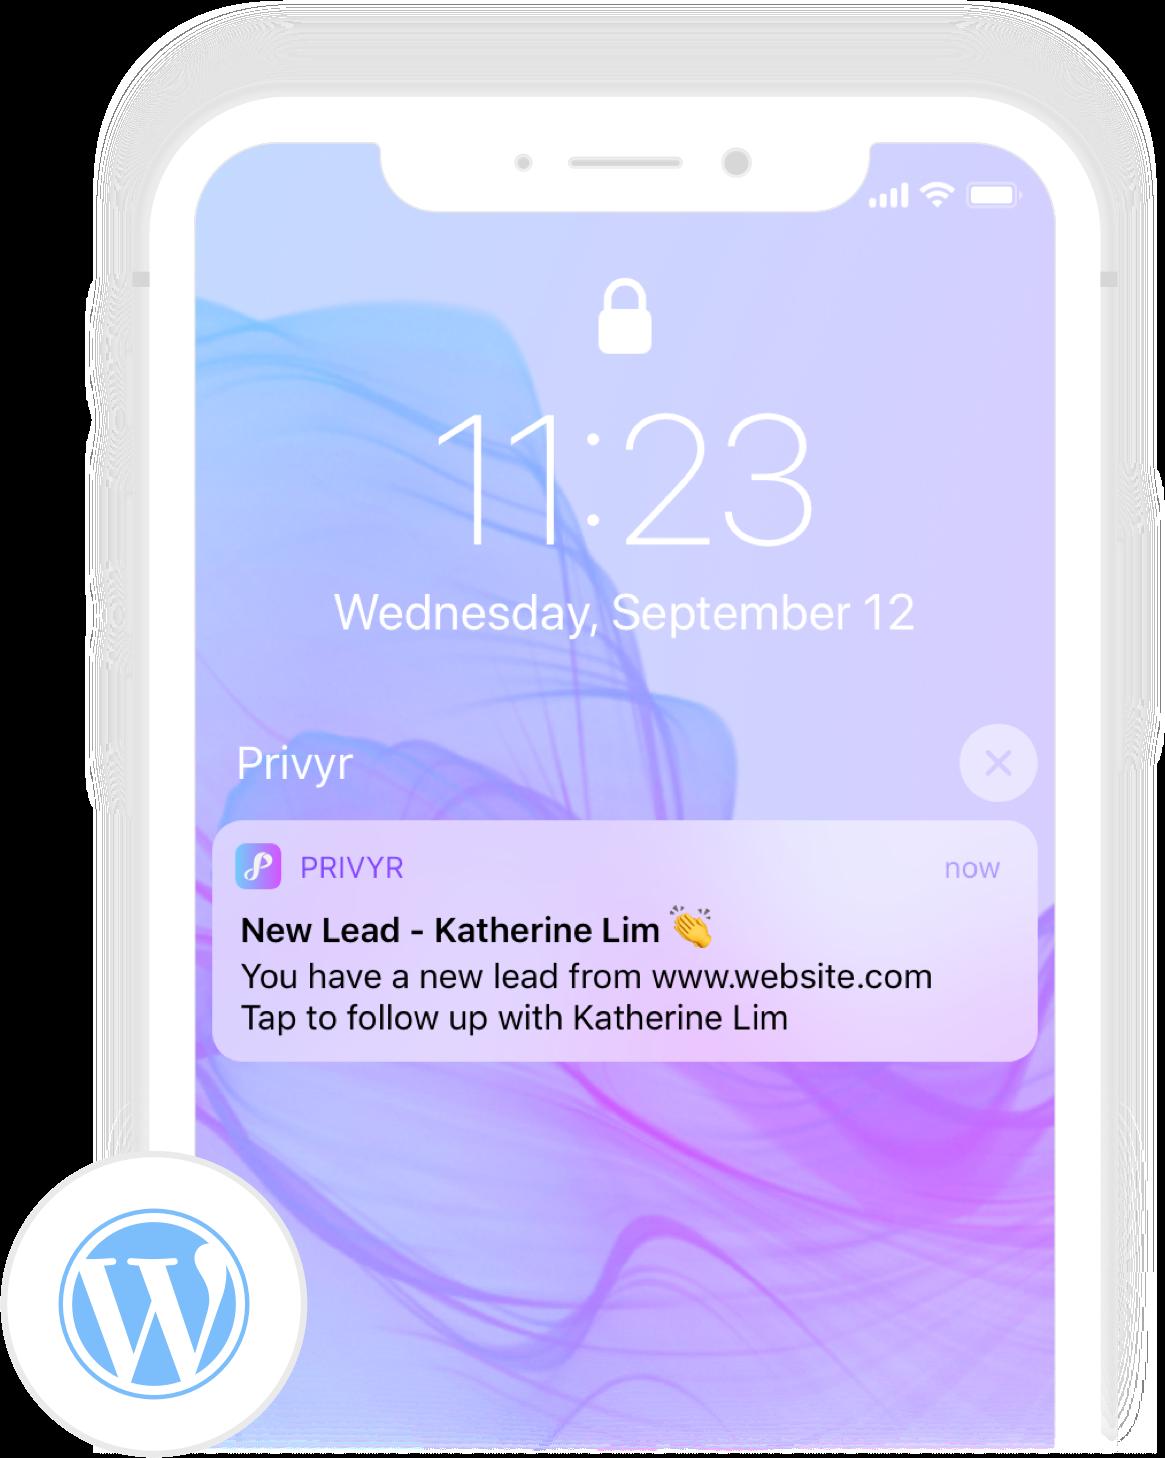 Privyr Device Screenshot